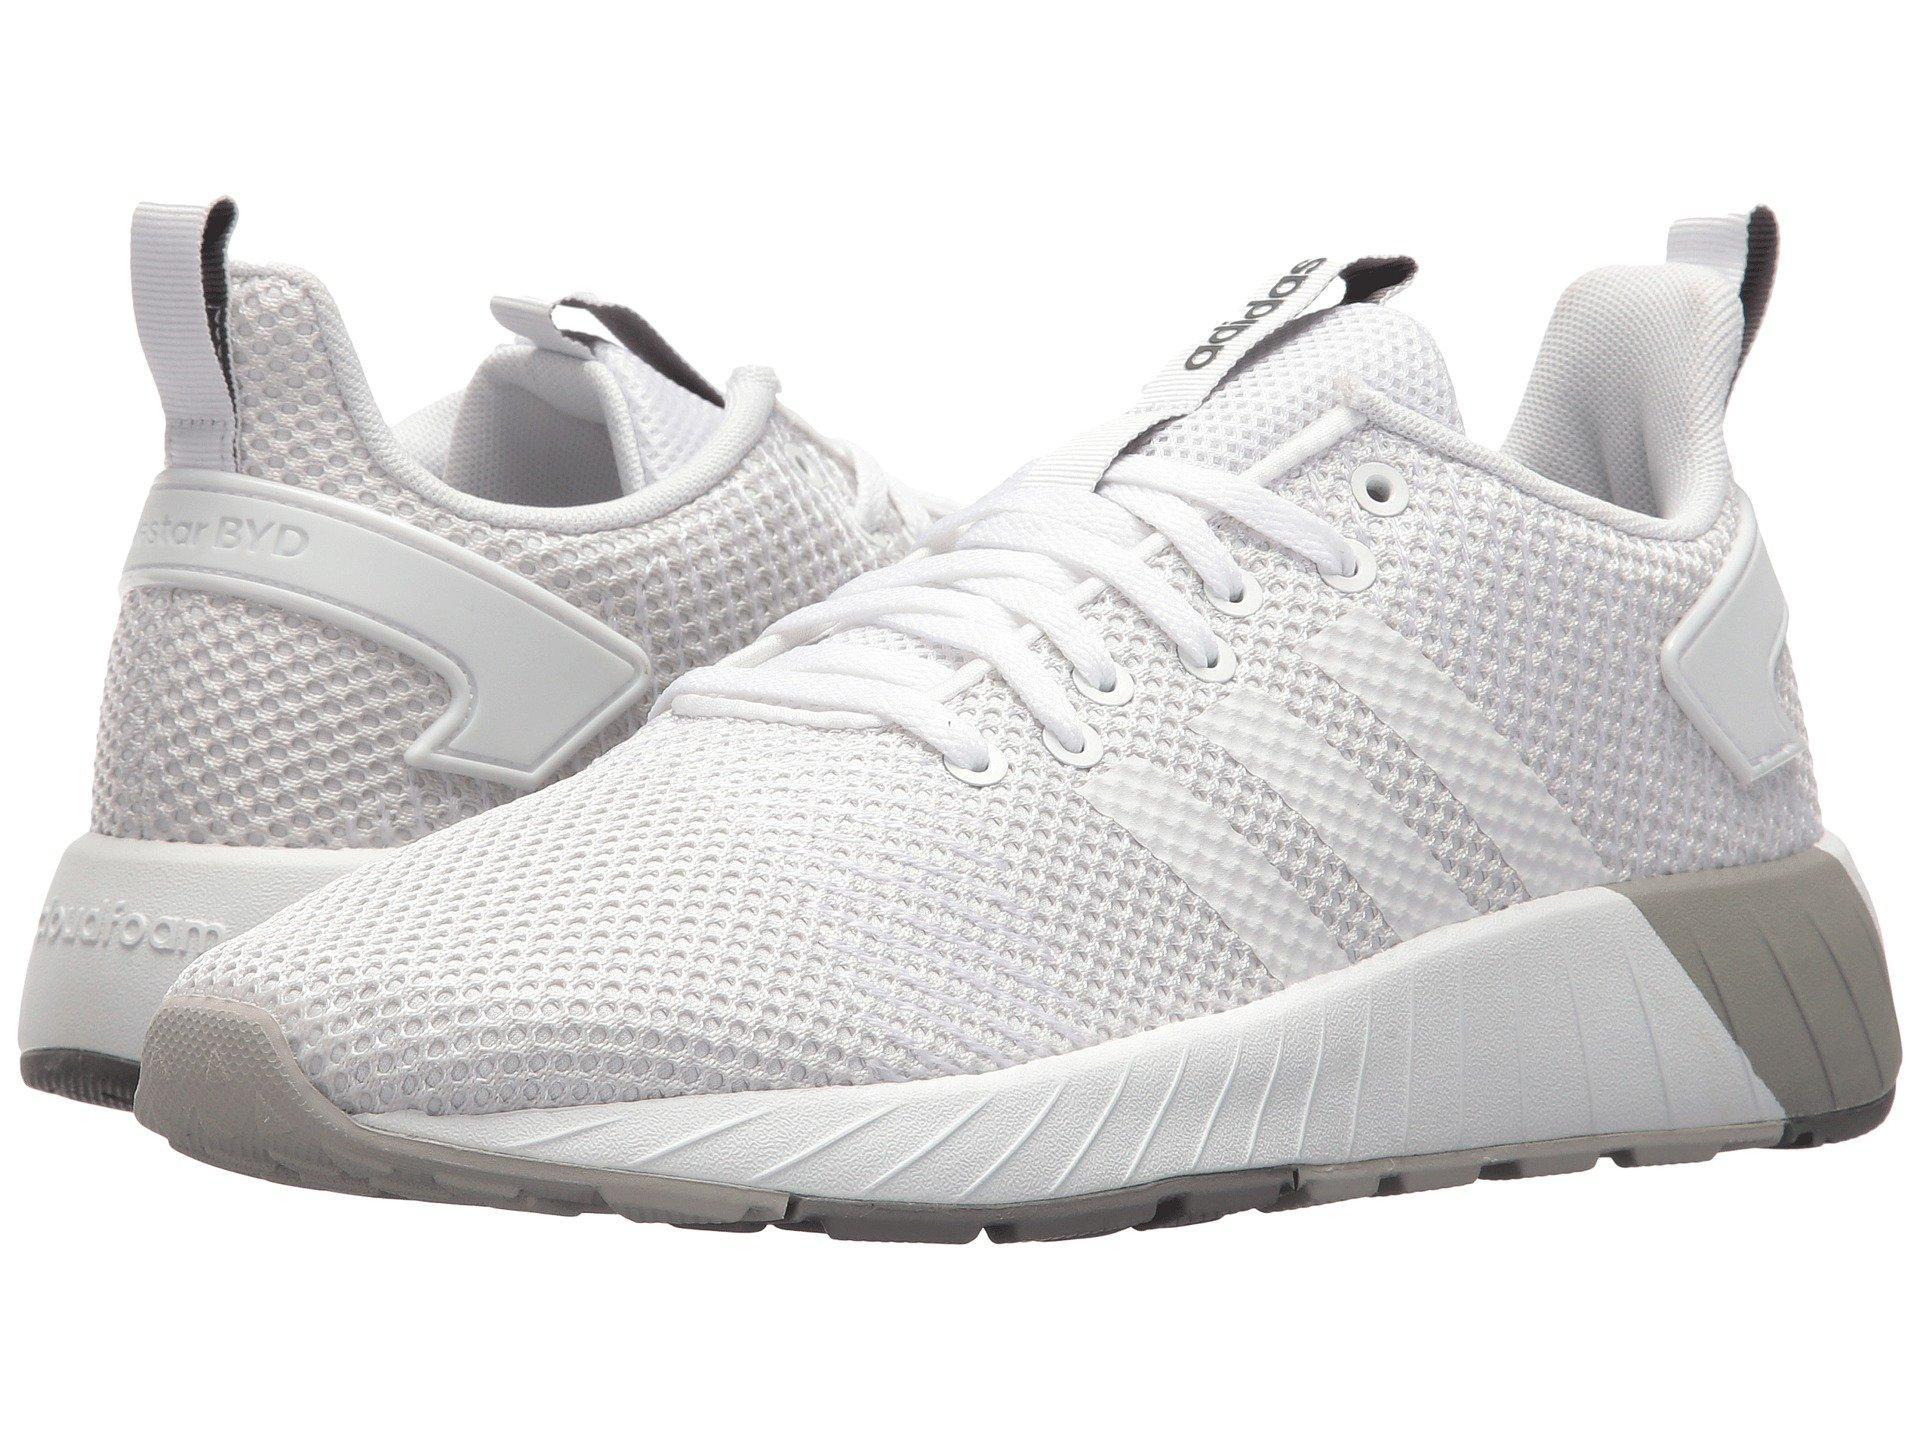 Adidas Originals Questar Byd, White/white/grey Two